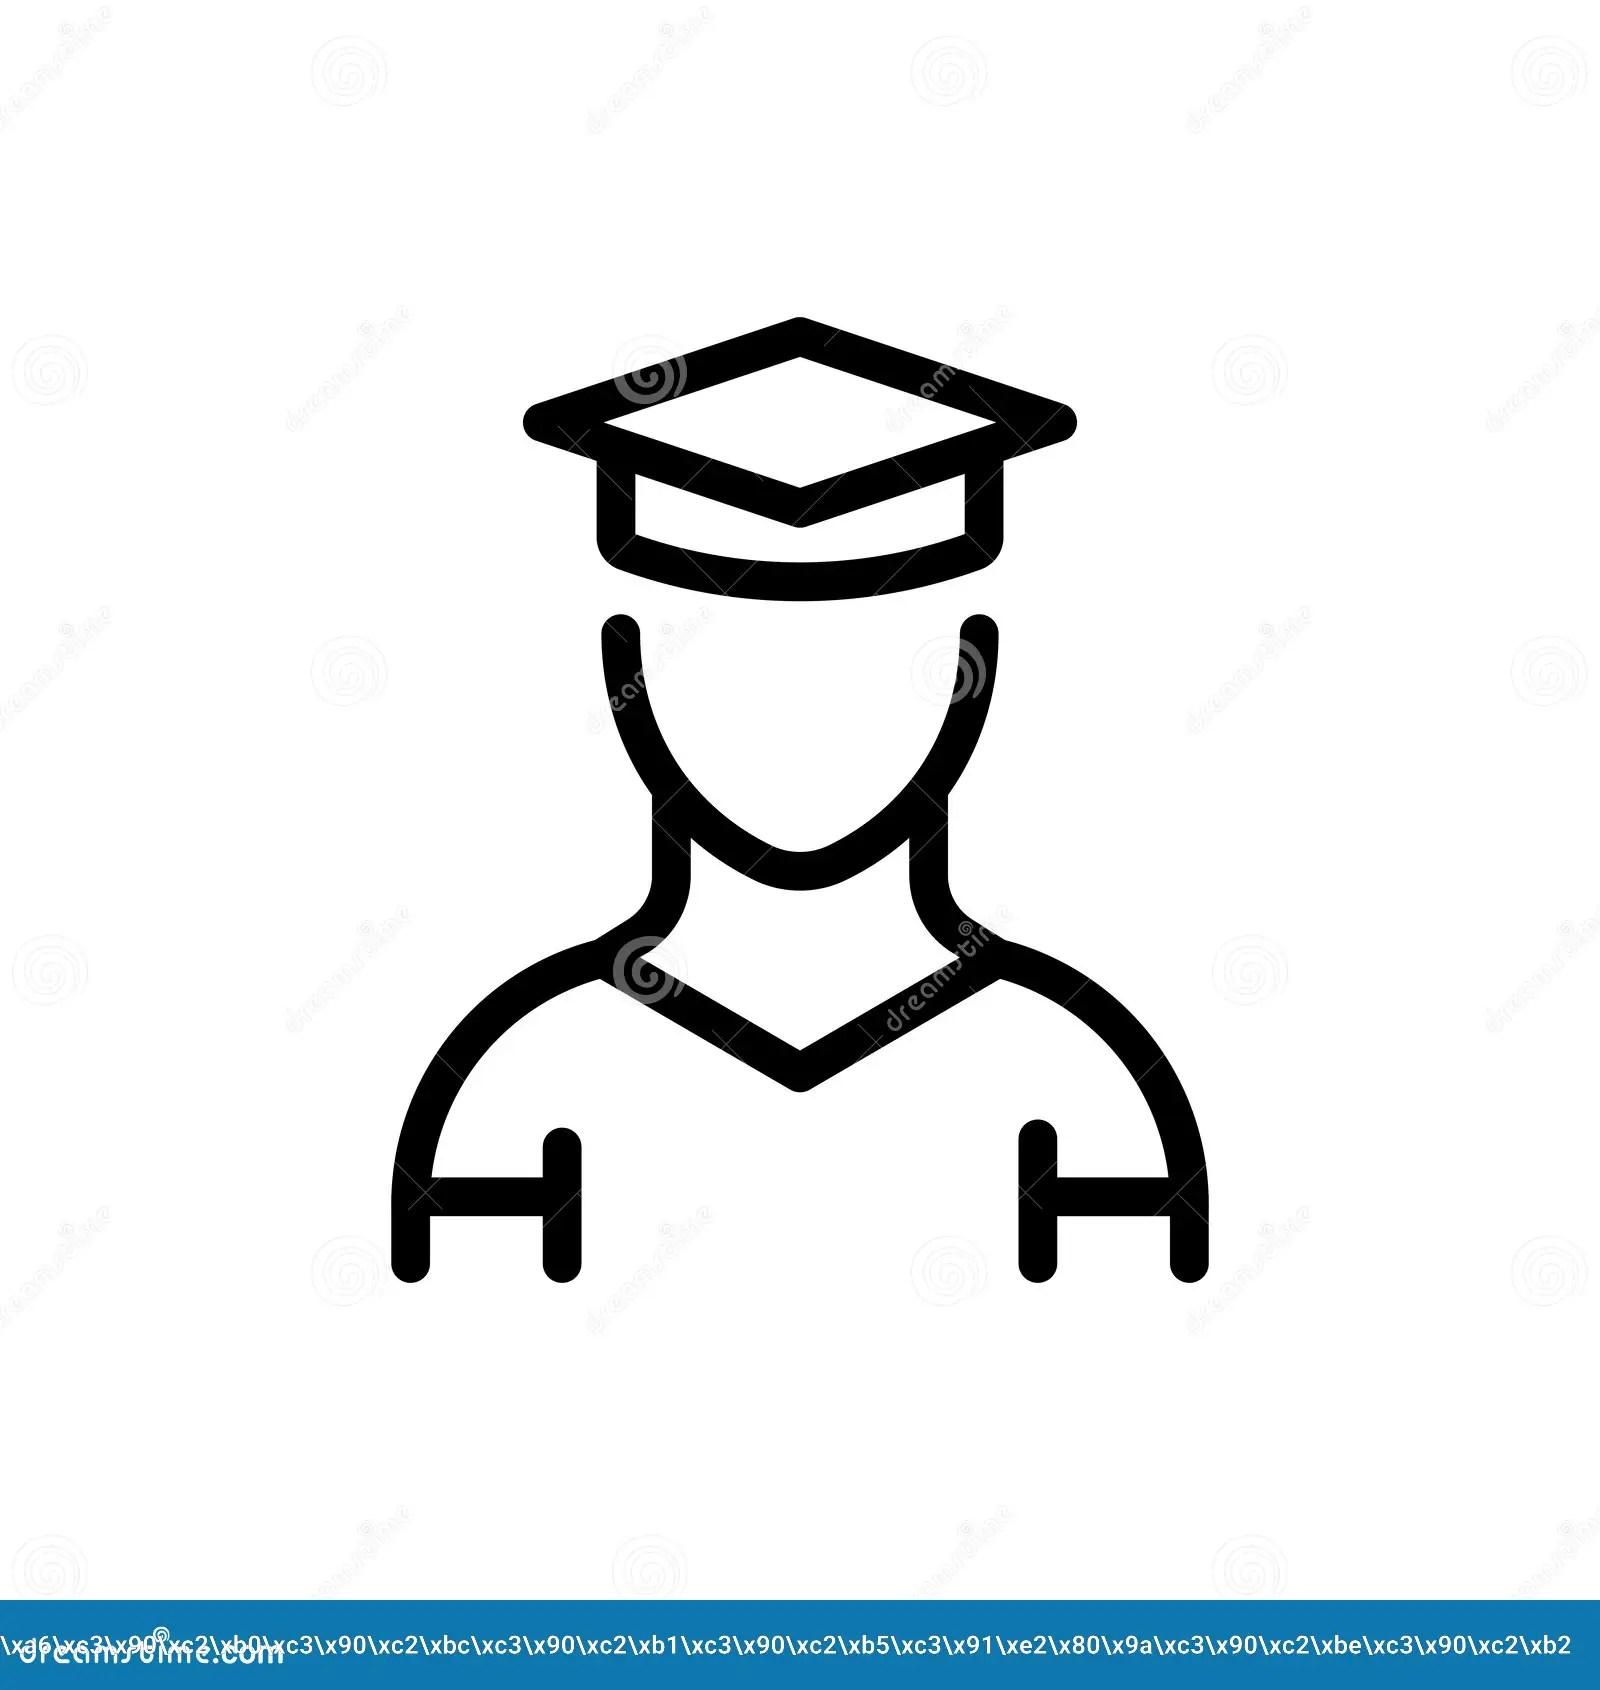 Student flat icon stock vector. Illustration of graduating